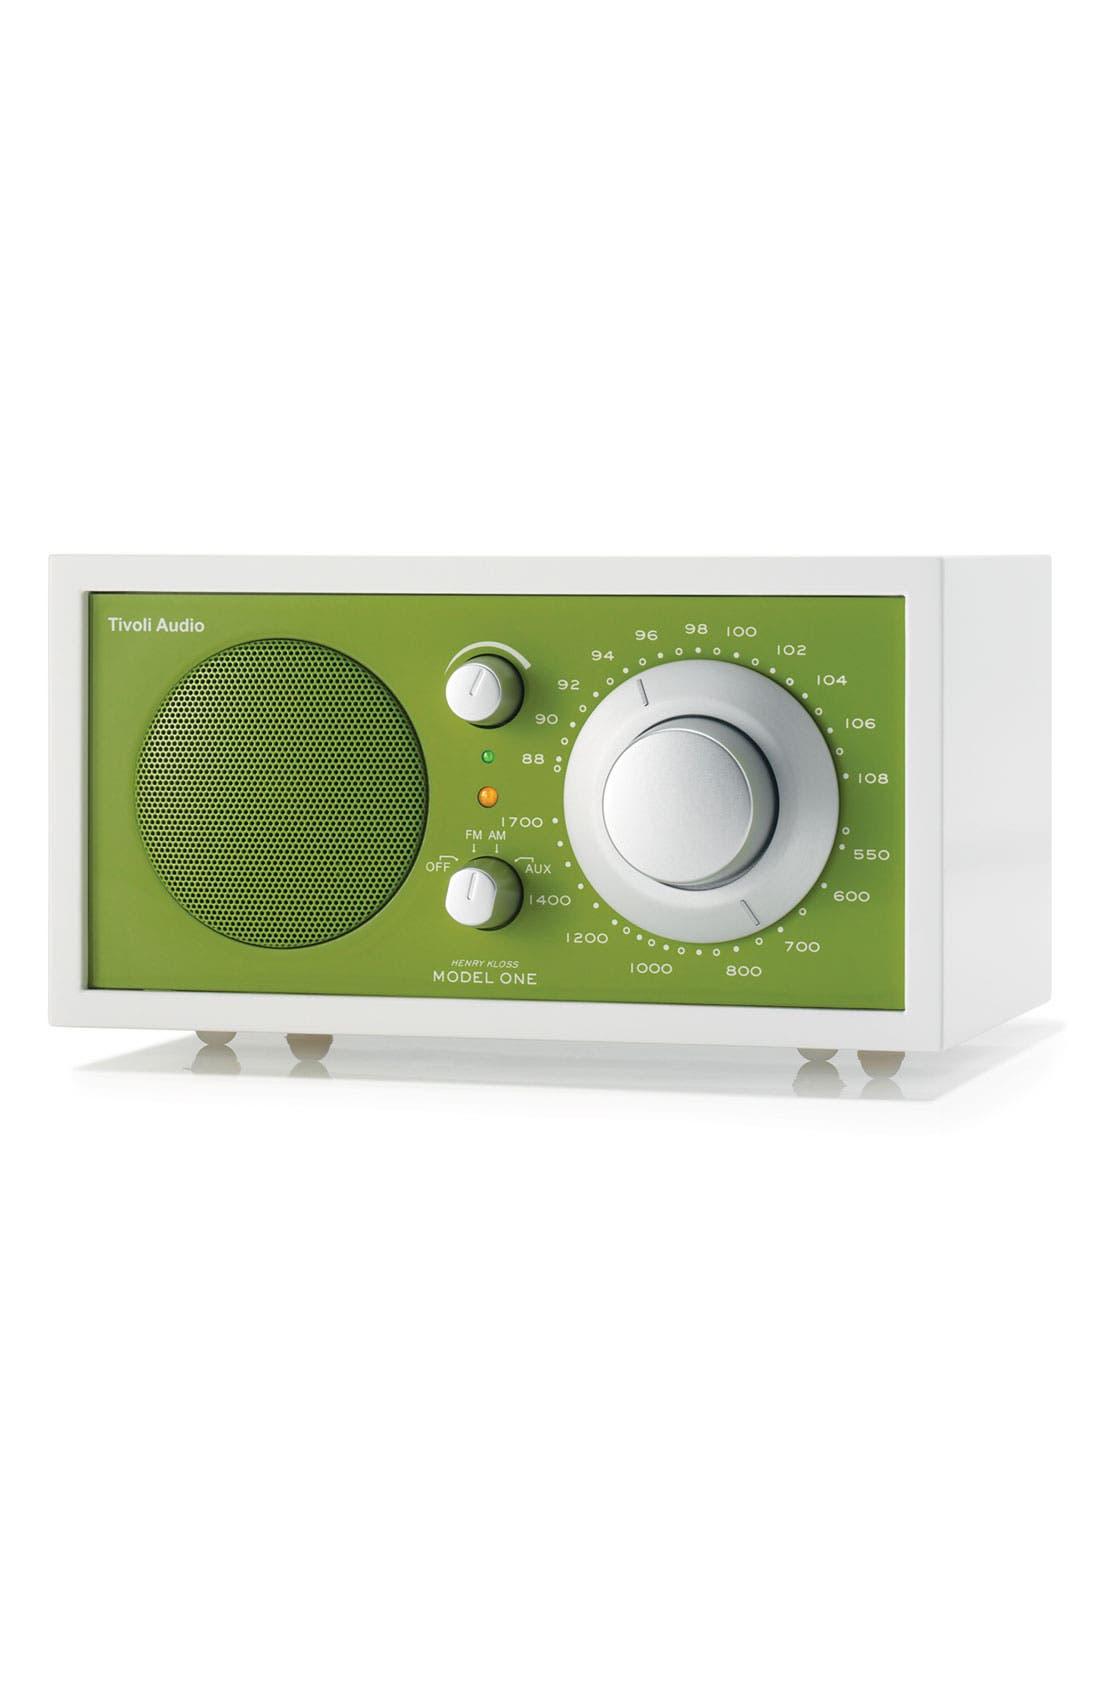 Main Image - Tivoli Audio 'Model One®' AM/FM Radio